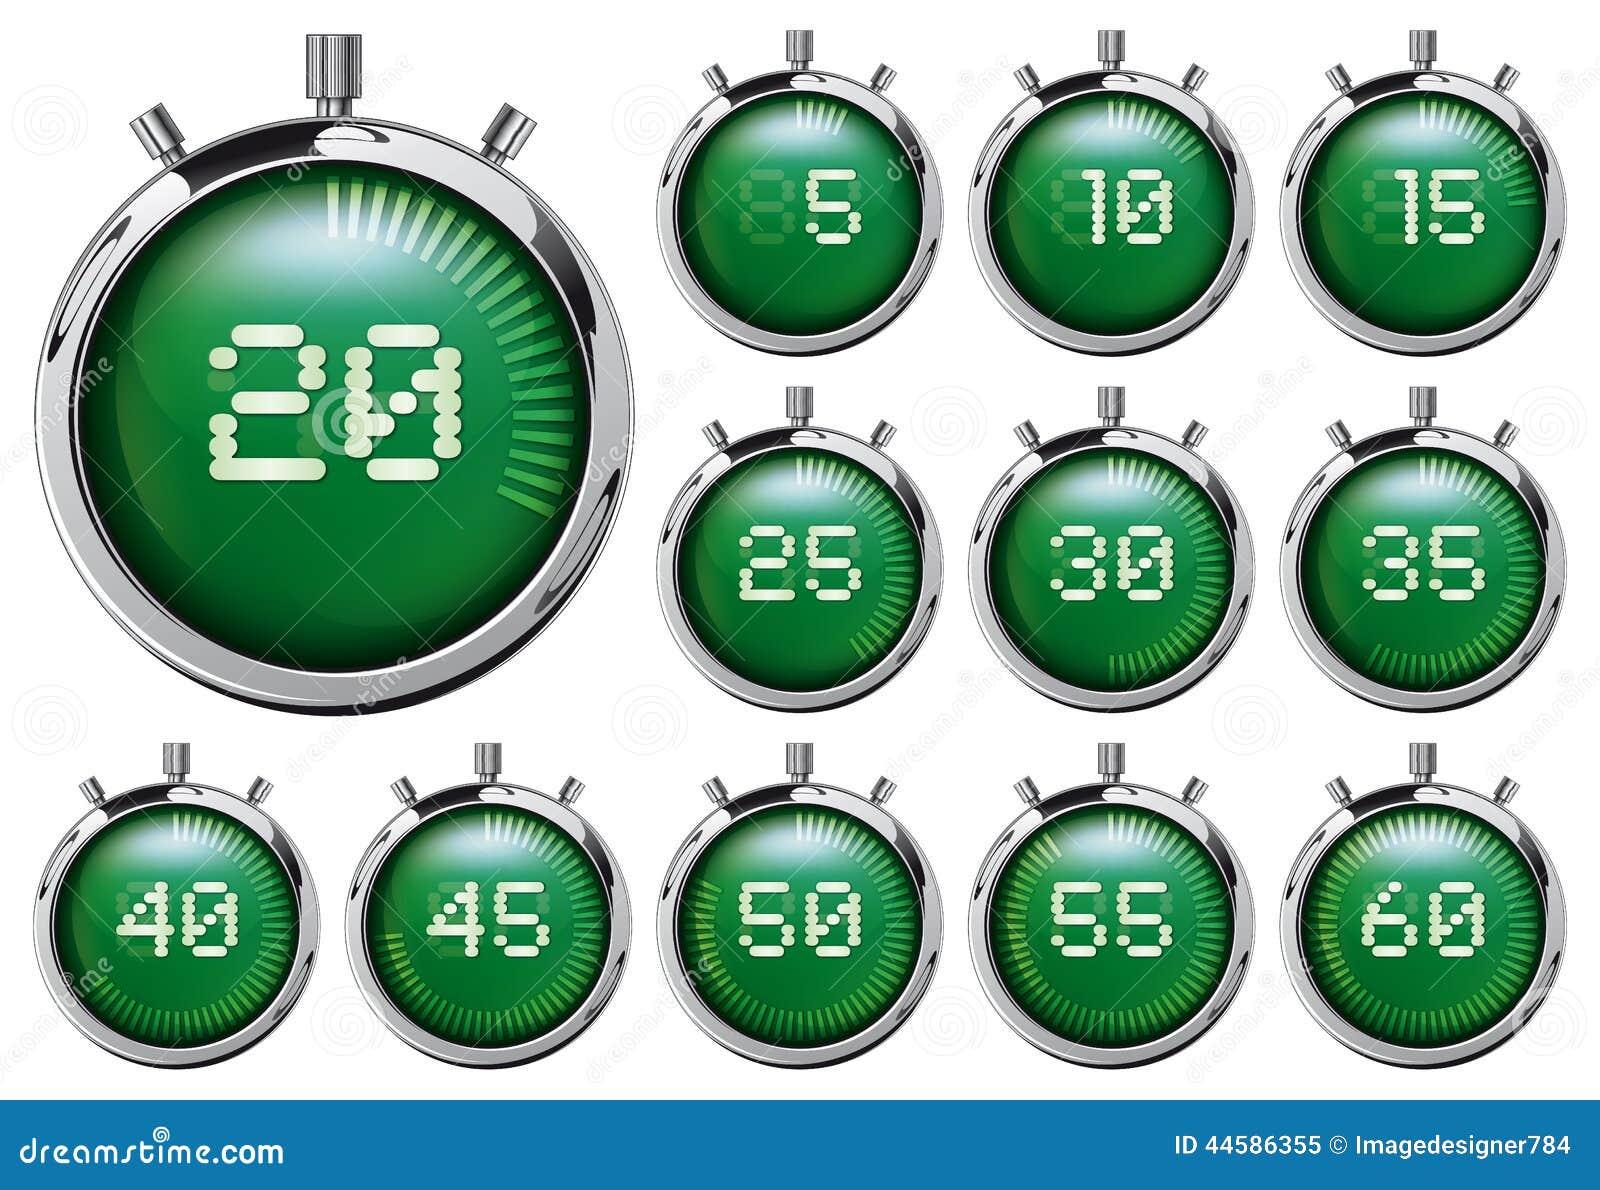 Stopwatch Insieme dei temporizzatori digitali verdi